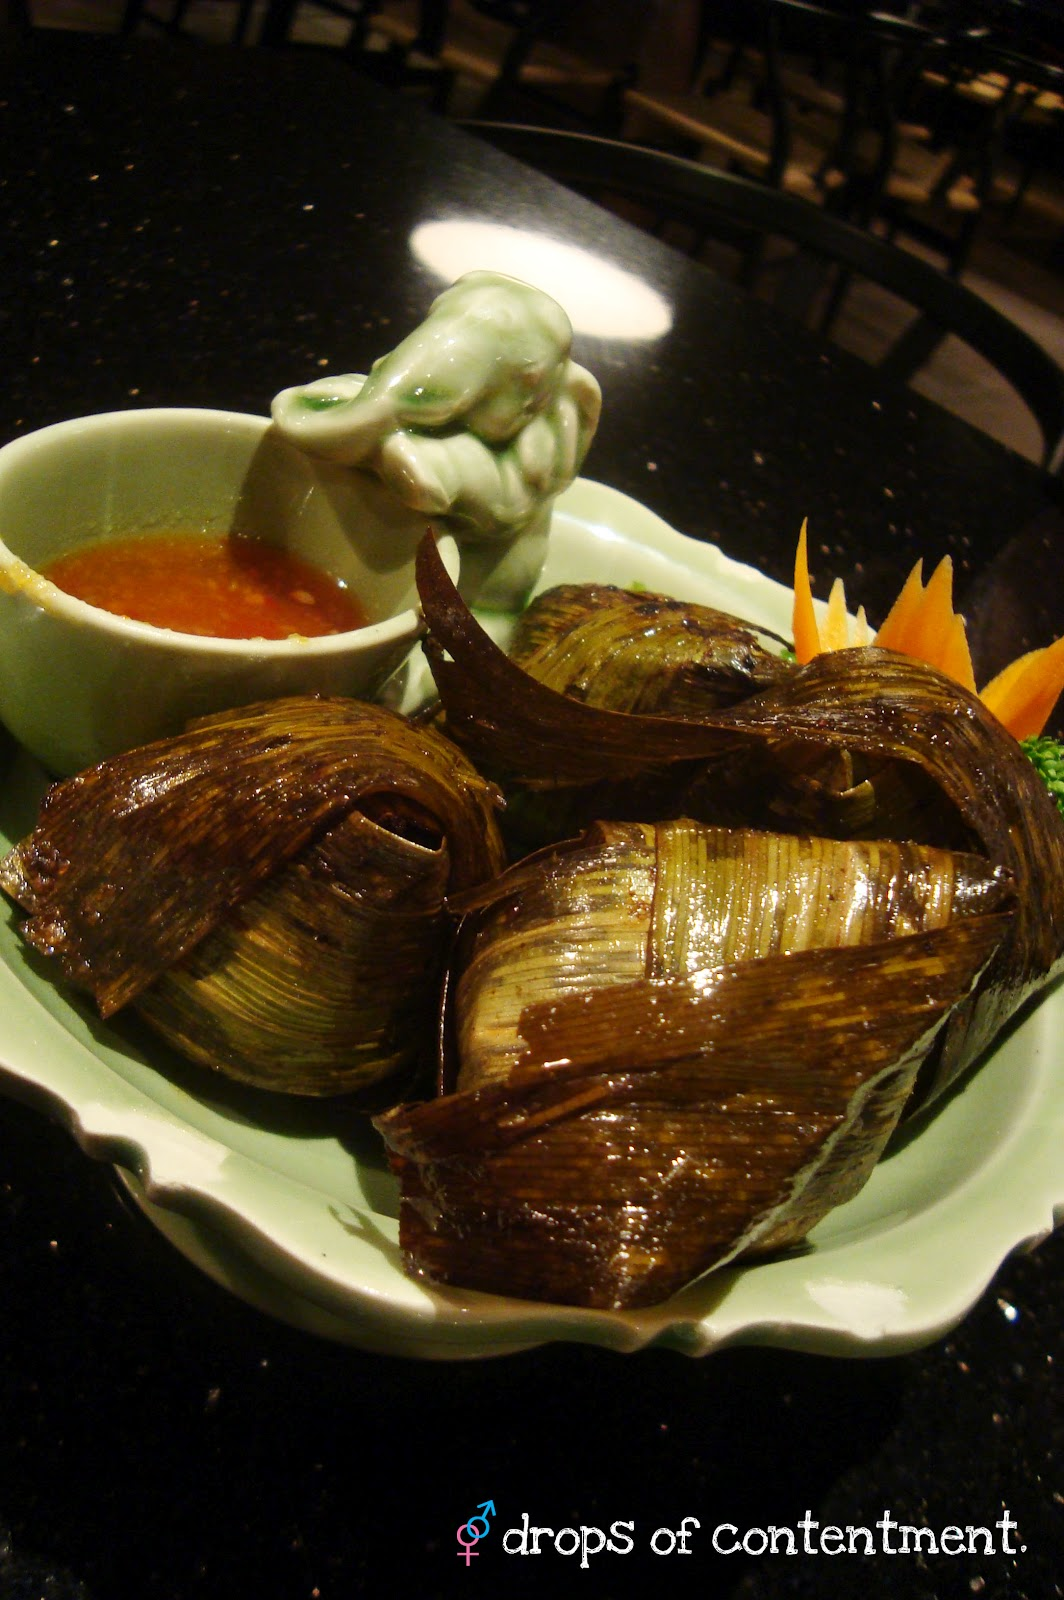 Wednesday september 26 2012 for Amarin thai cuisine menu